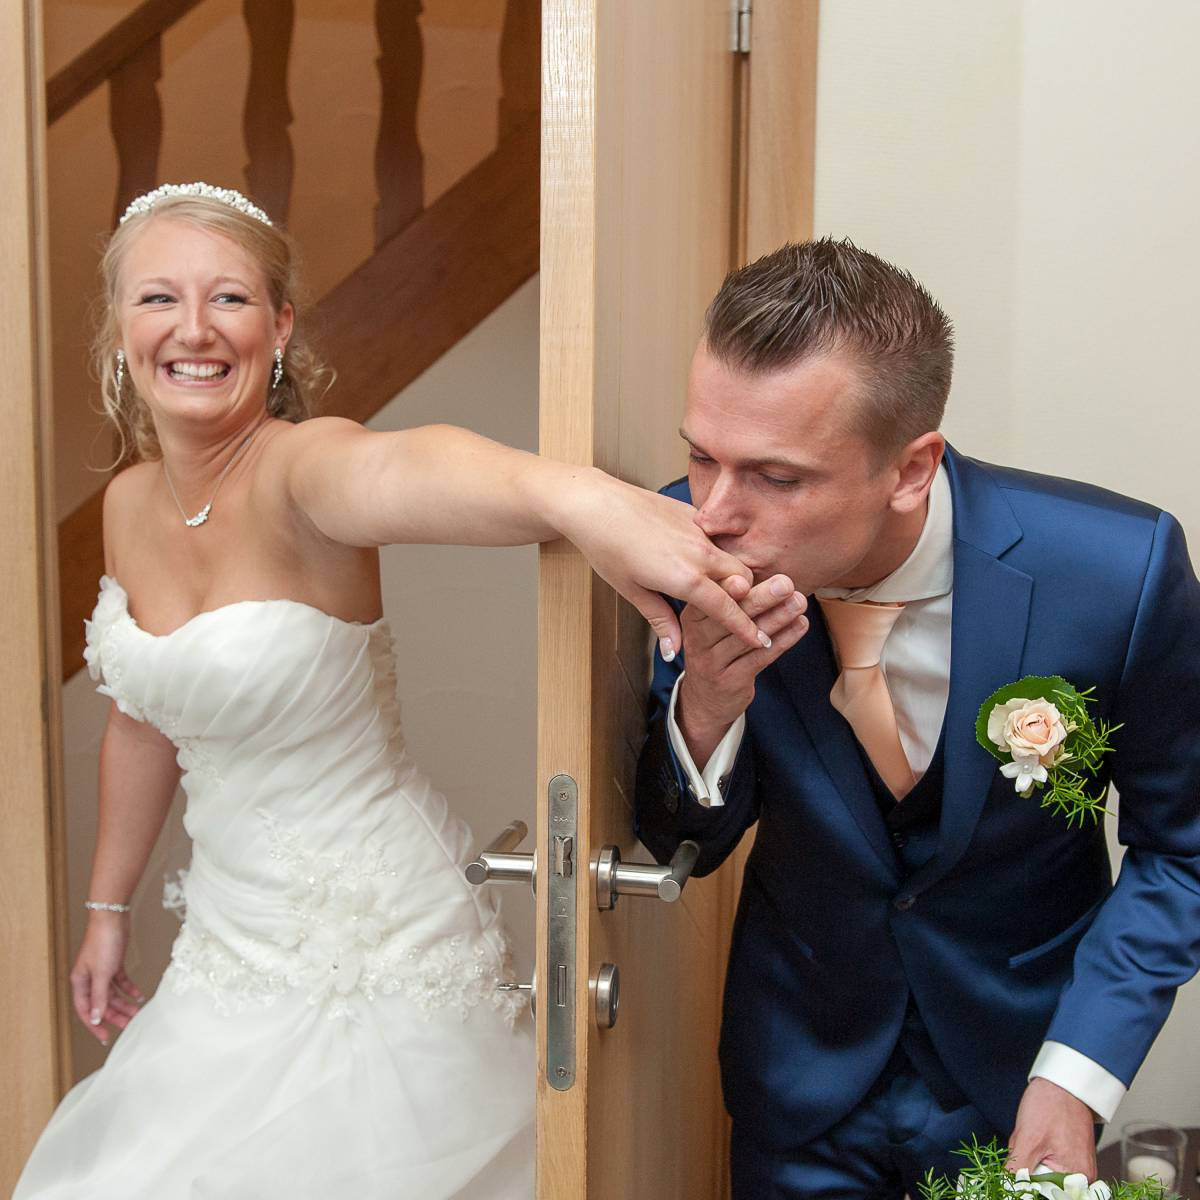 Foto Meeuw - House of Weddings - 22